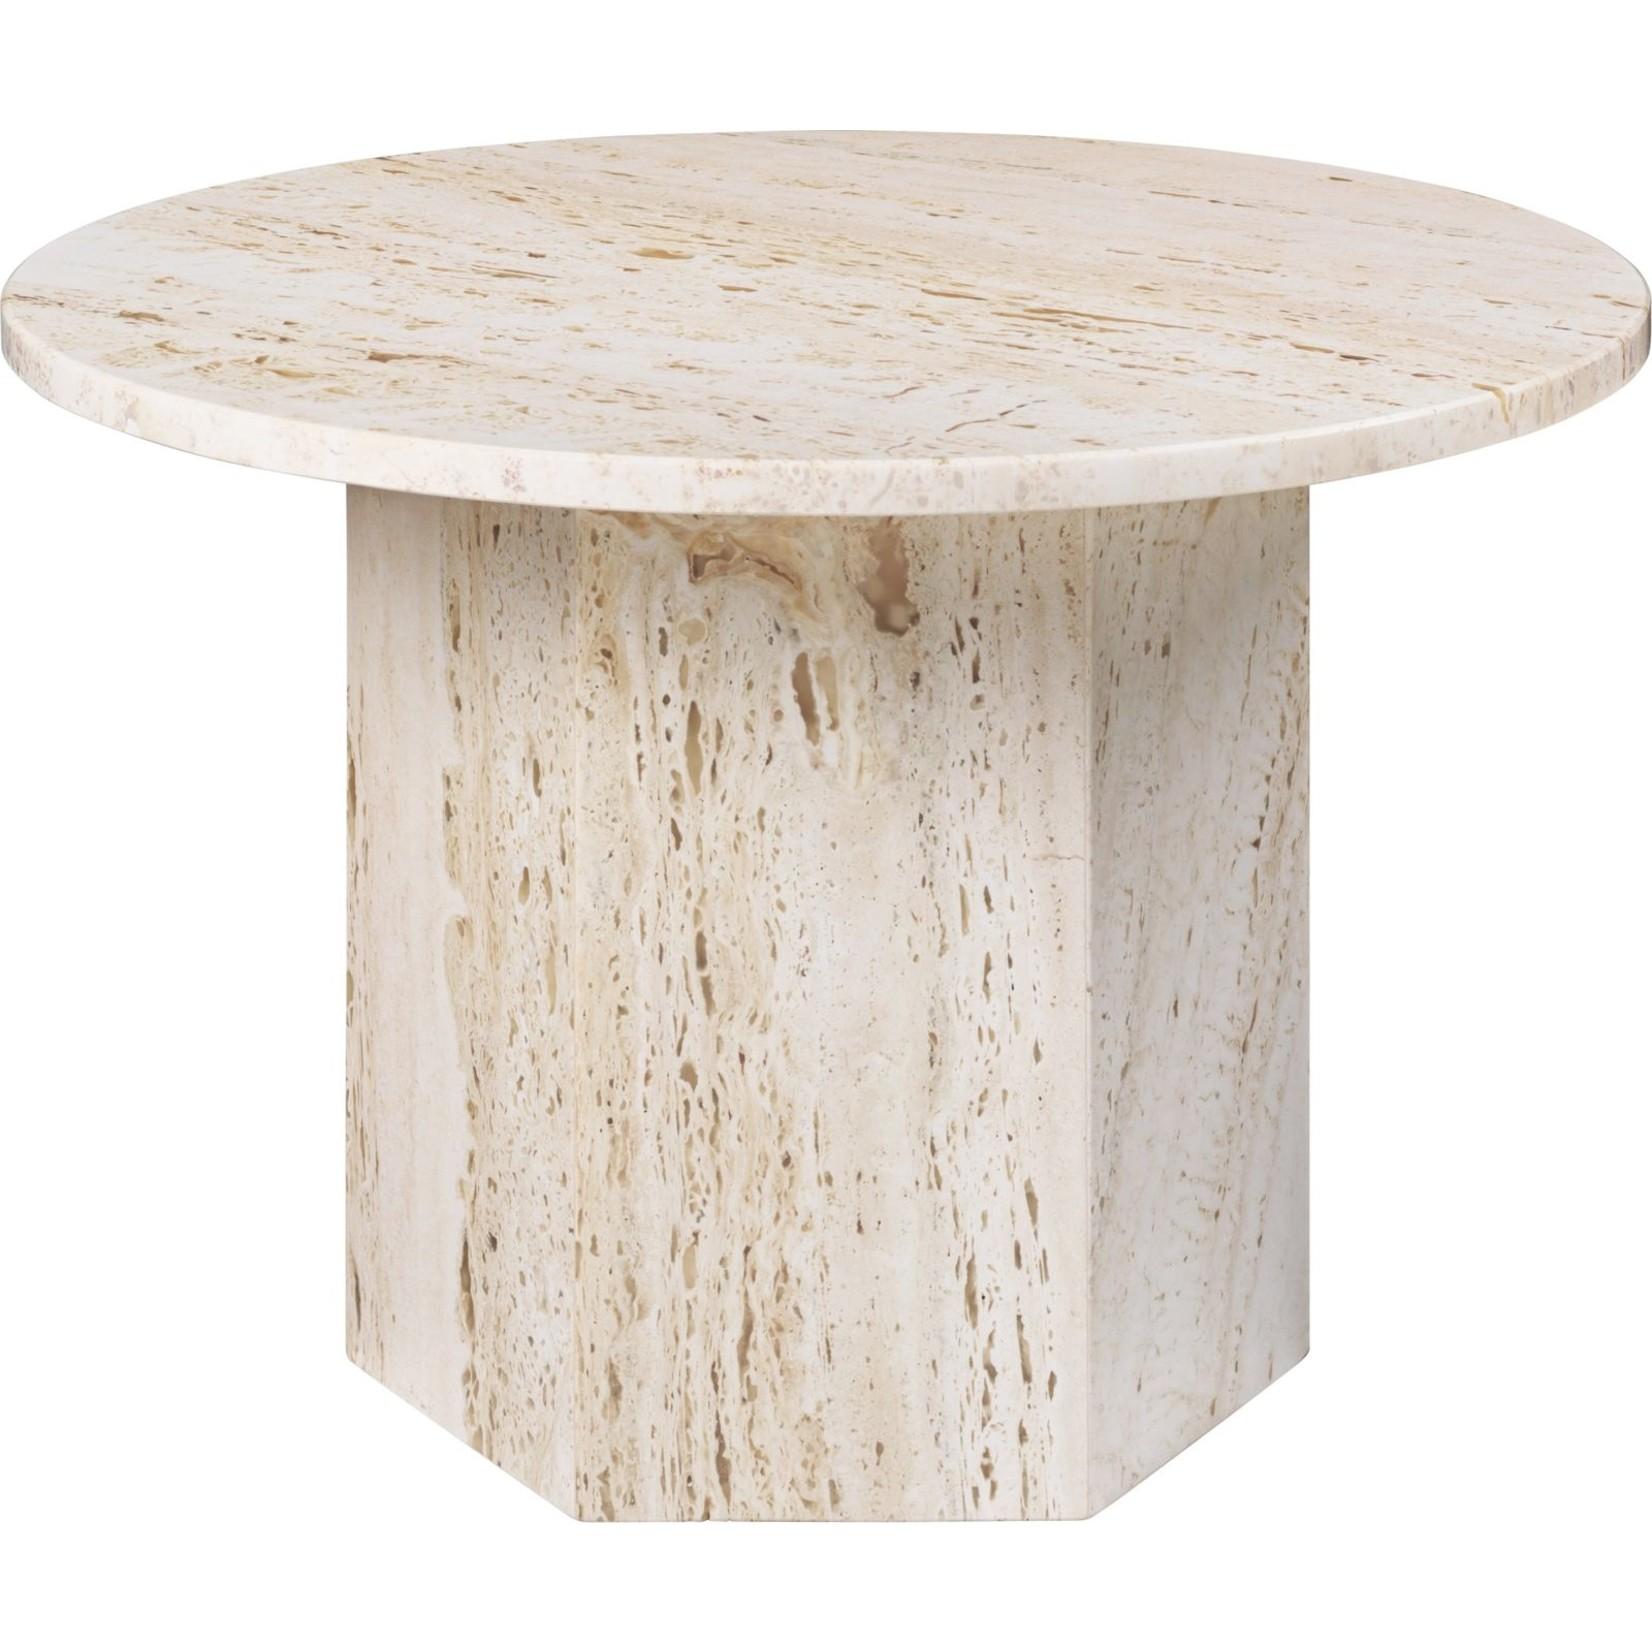 Gubi Epic Coffee Table Round Ø60 | White Travertine